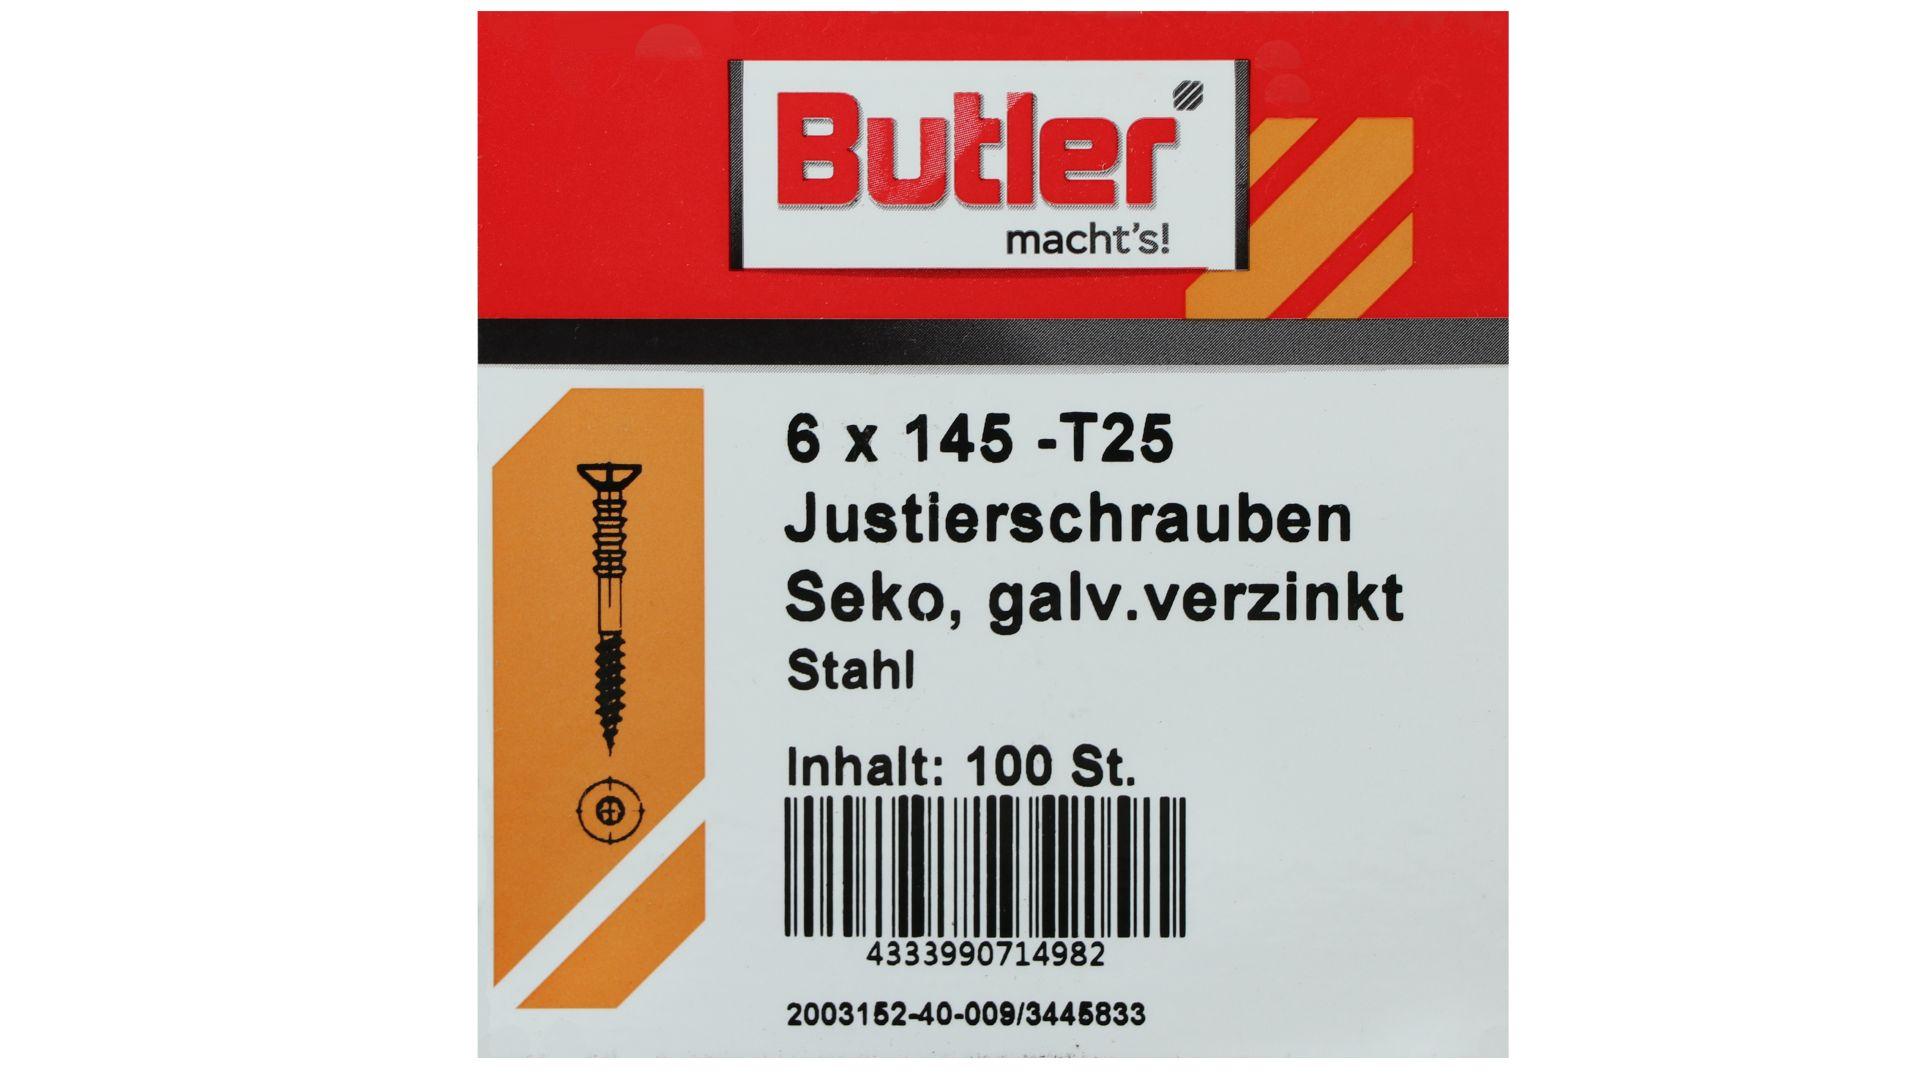 Butler macht's! Justierschraube, Stahl, Senkkopf, galvanisch verzinkt, T25, 6 x 145 mm, 100 Stück